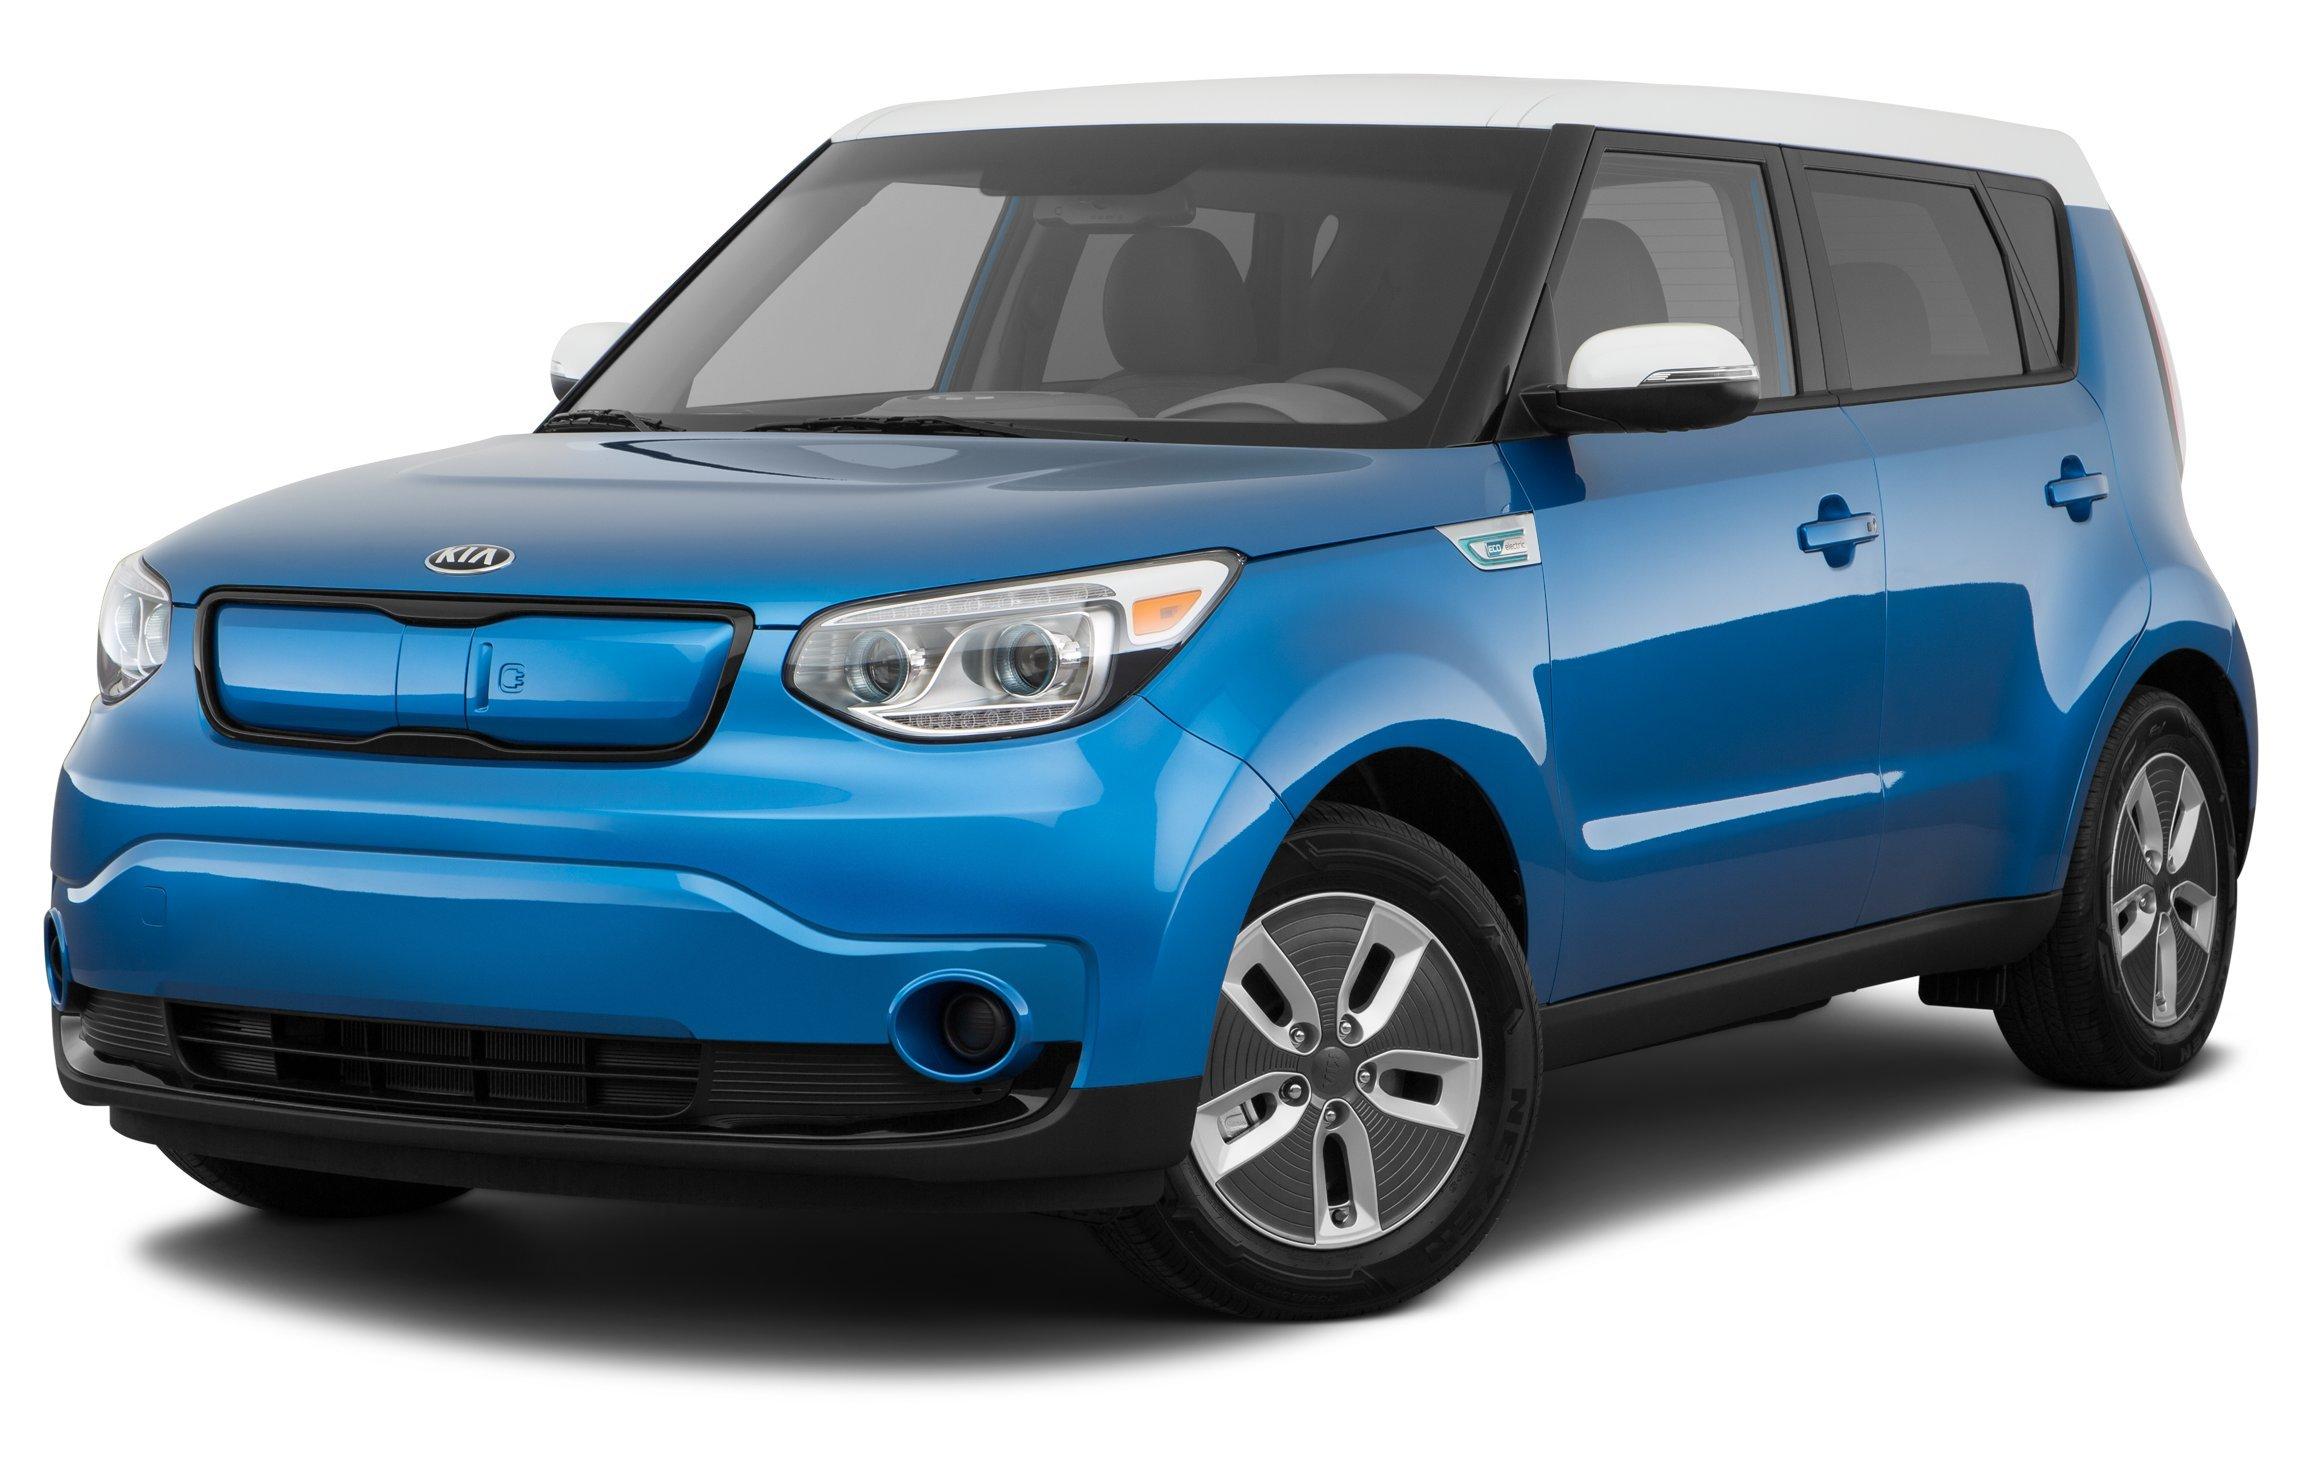 Kia Soul: Good driving practices